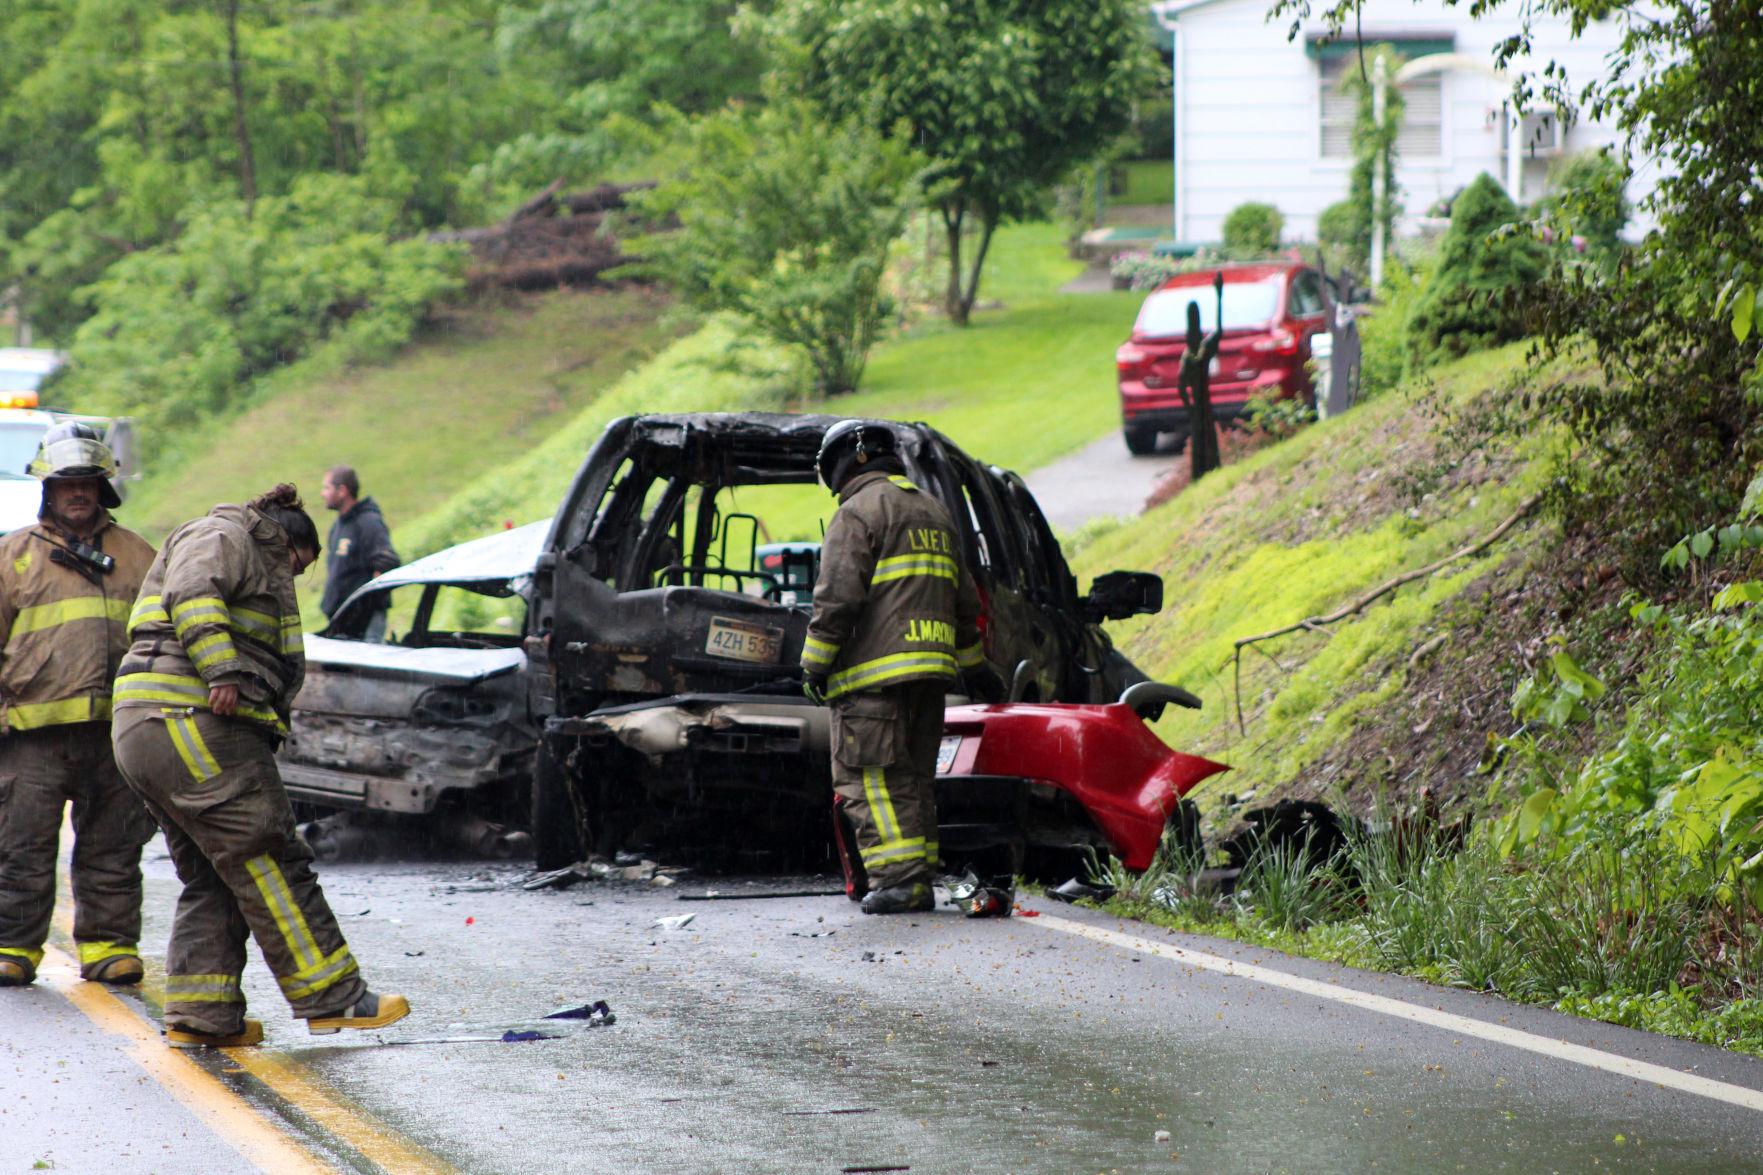 One Victim In Fatal Wayne Car Crash Is Identified News Herald